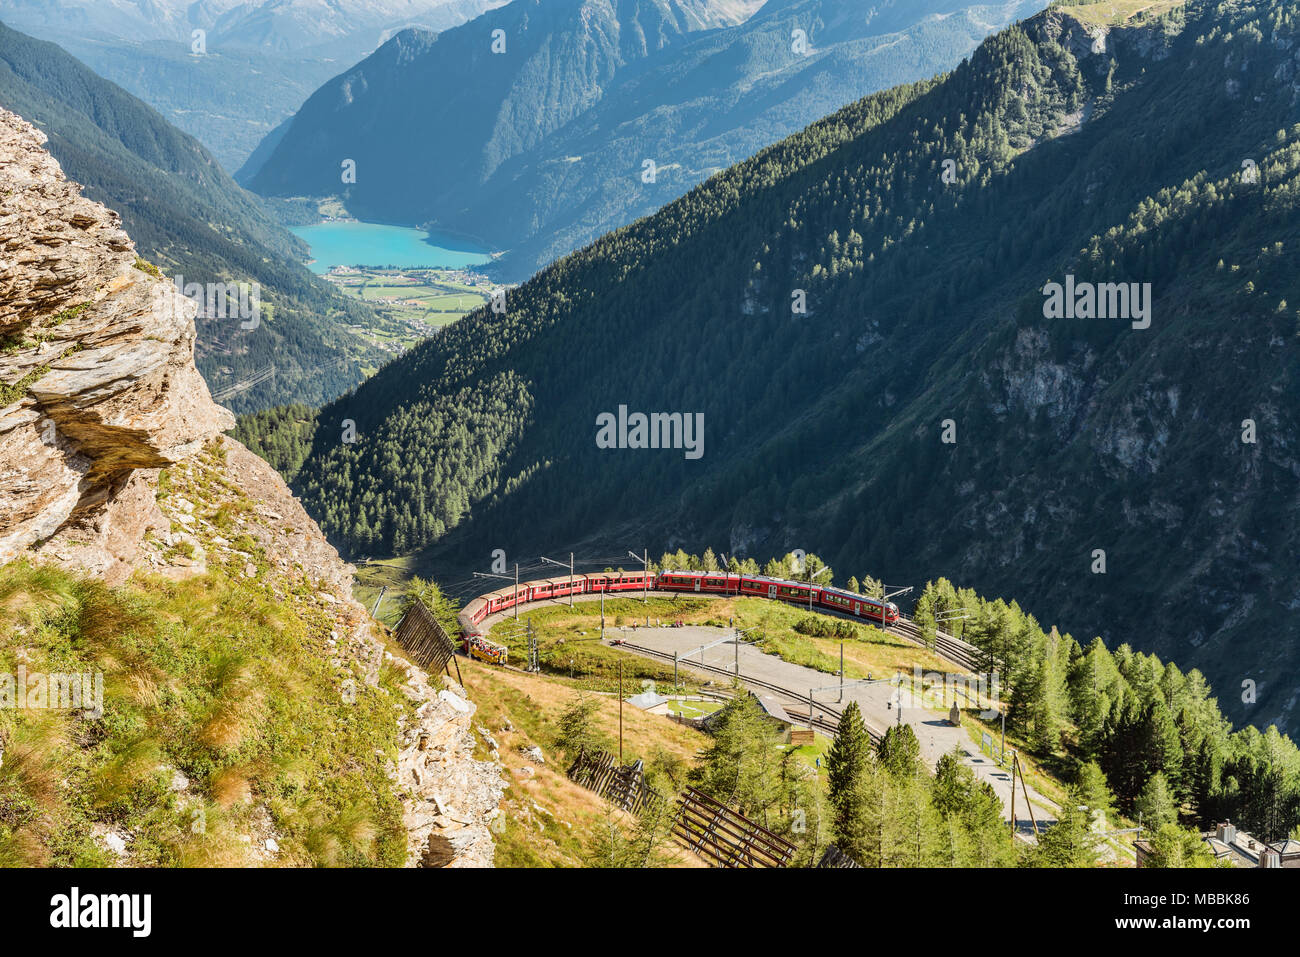 Mountain train at Alp Gruem train station, with the Valposchiavo in the background, Engadin, Switzerland | Bergzug an der Alp Gruem Zugstation mit dem - Stock Image